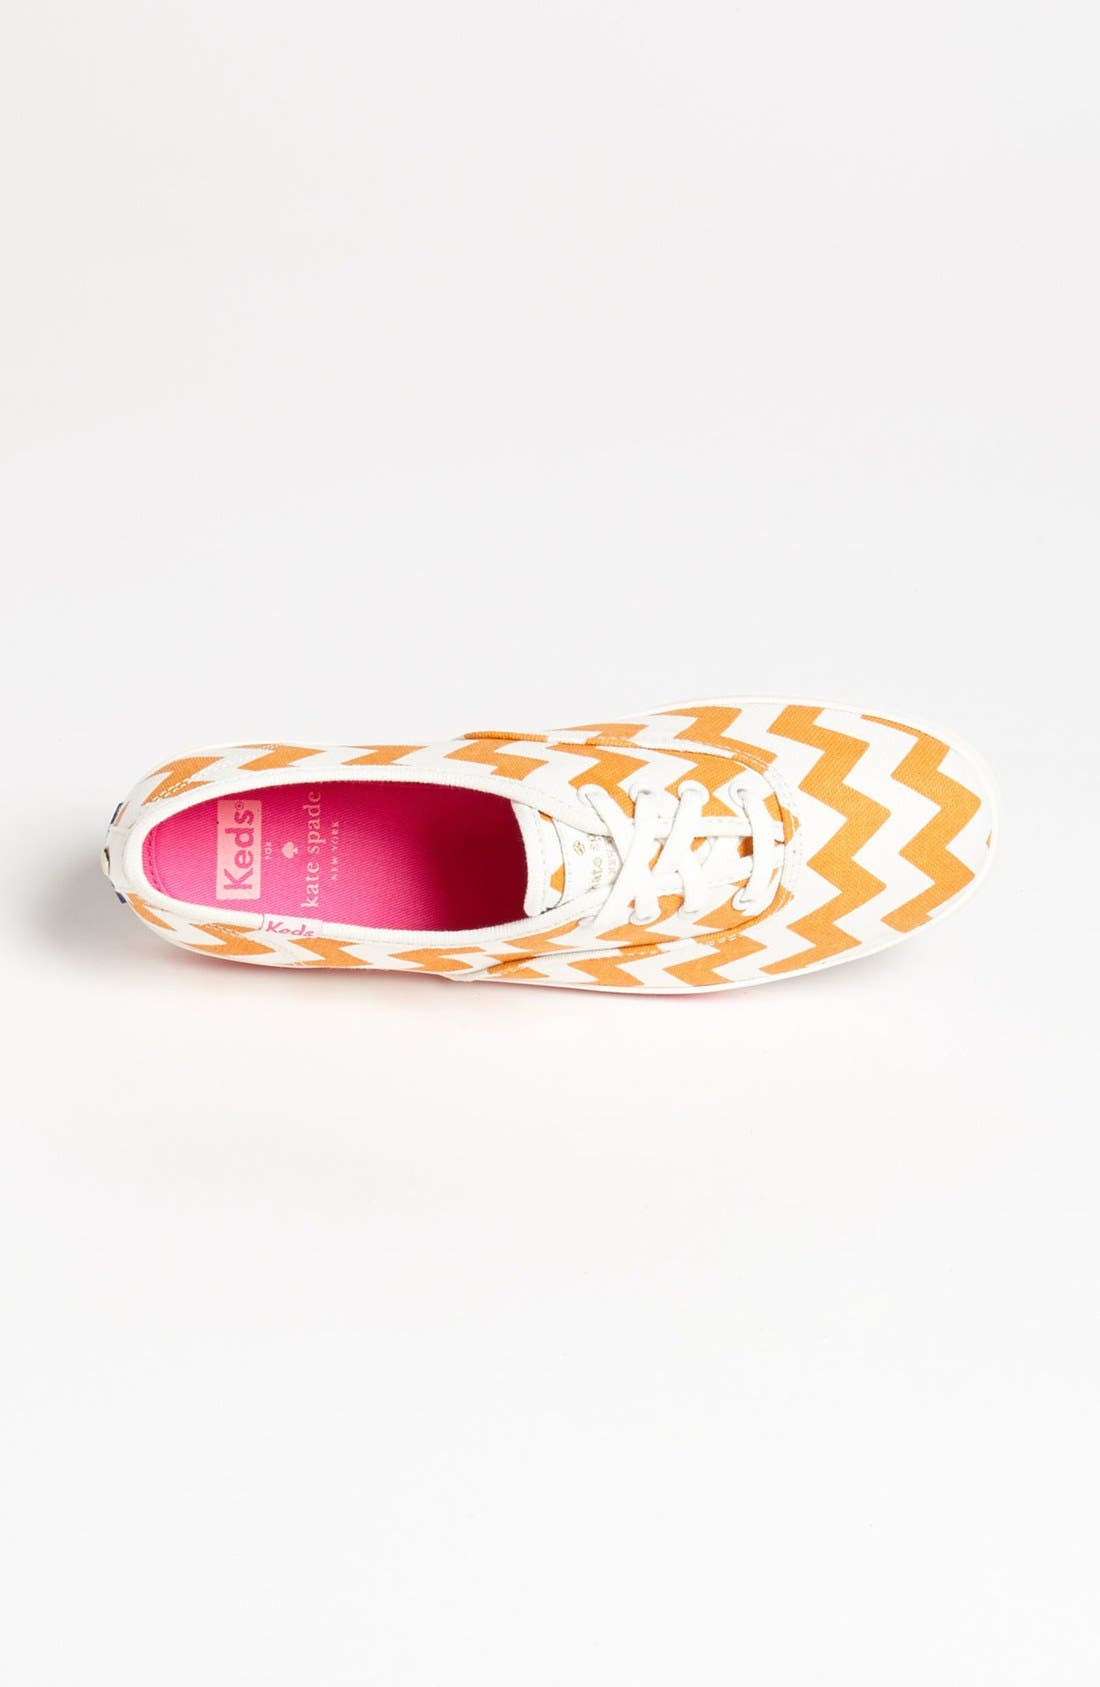 Keds<sup>®</sup> for kate spade new york 'kick' sneaker,                             Alternate thumbnail 16, color,